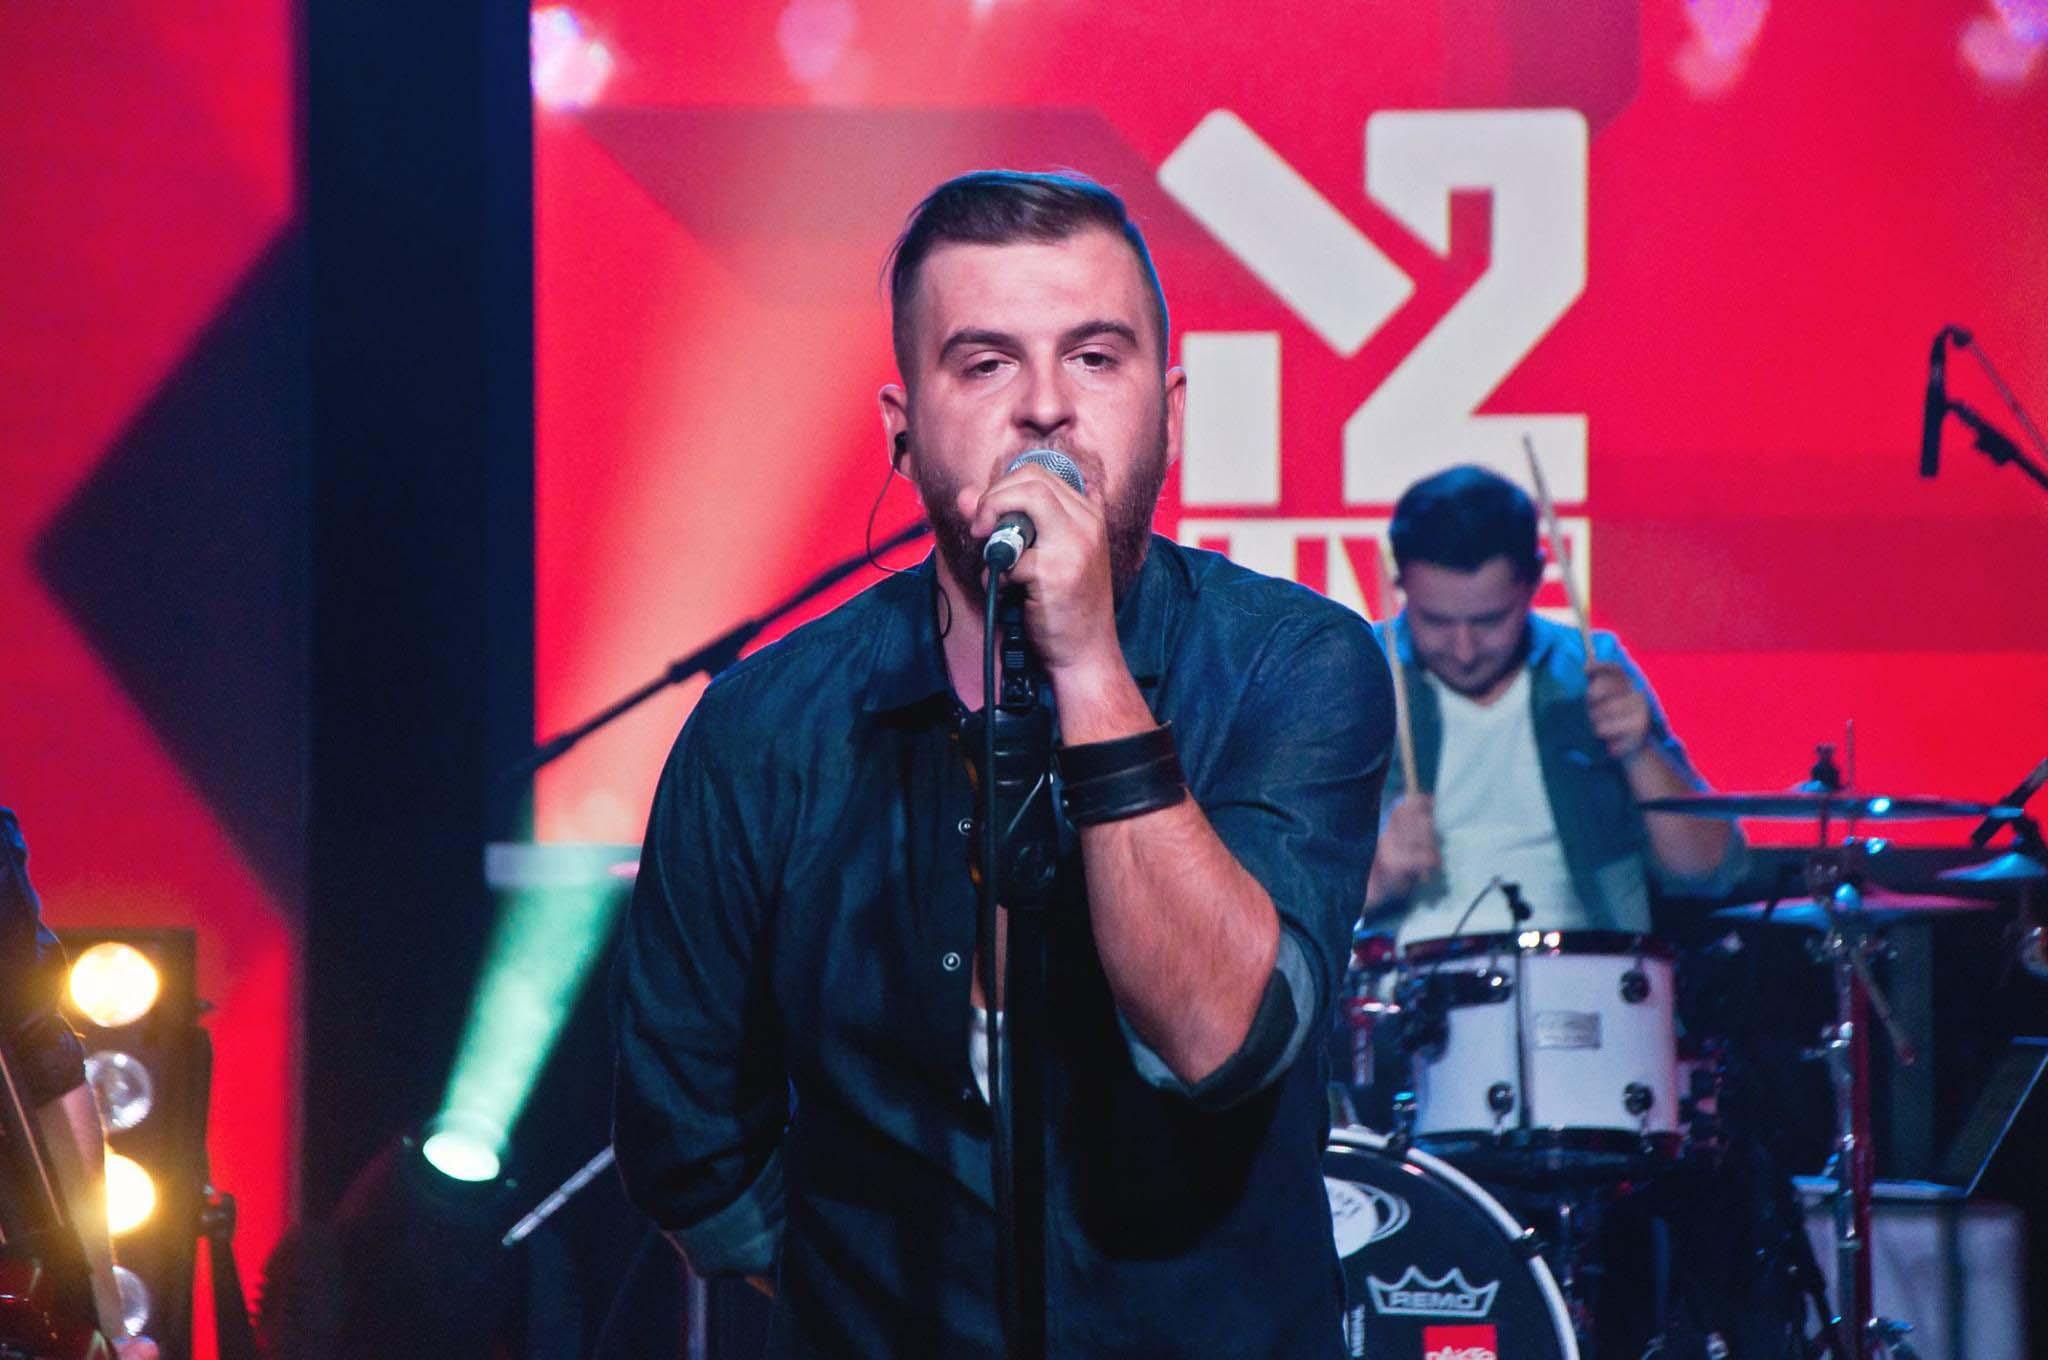 bezobmezhen1 ФОТОГАЛЕРЕЯ — UA MUSIC   Енциклопедія української музики